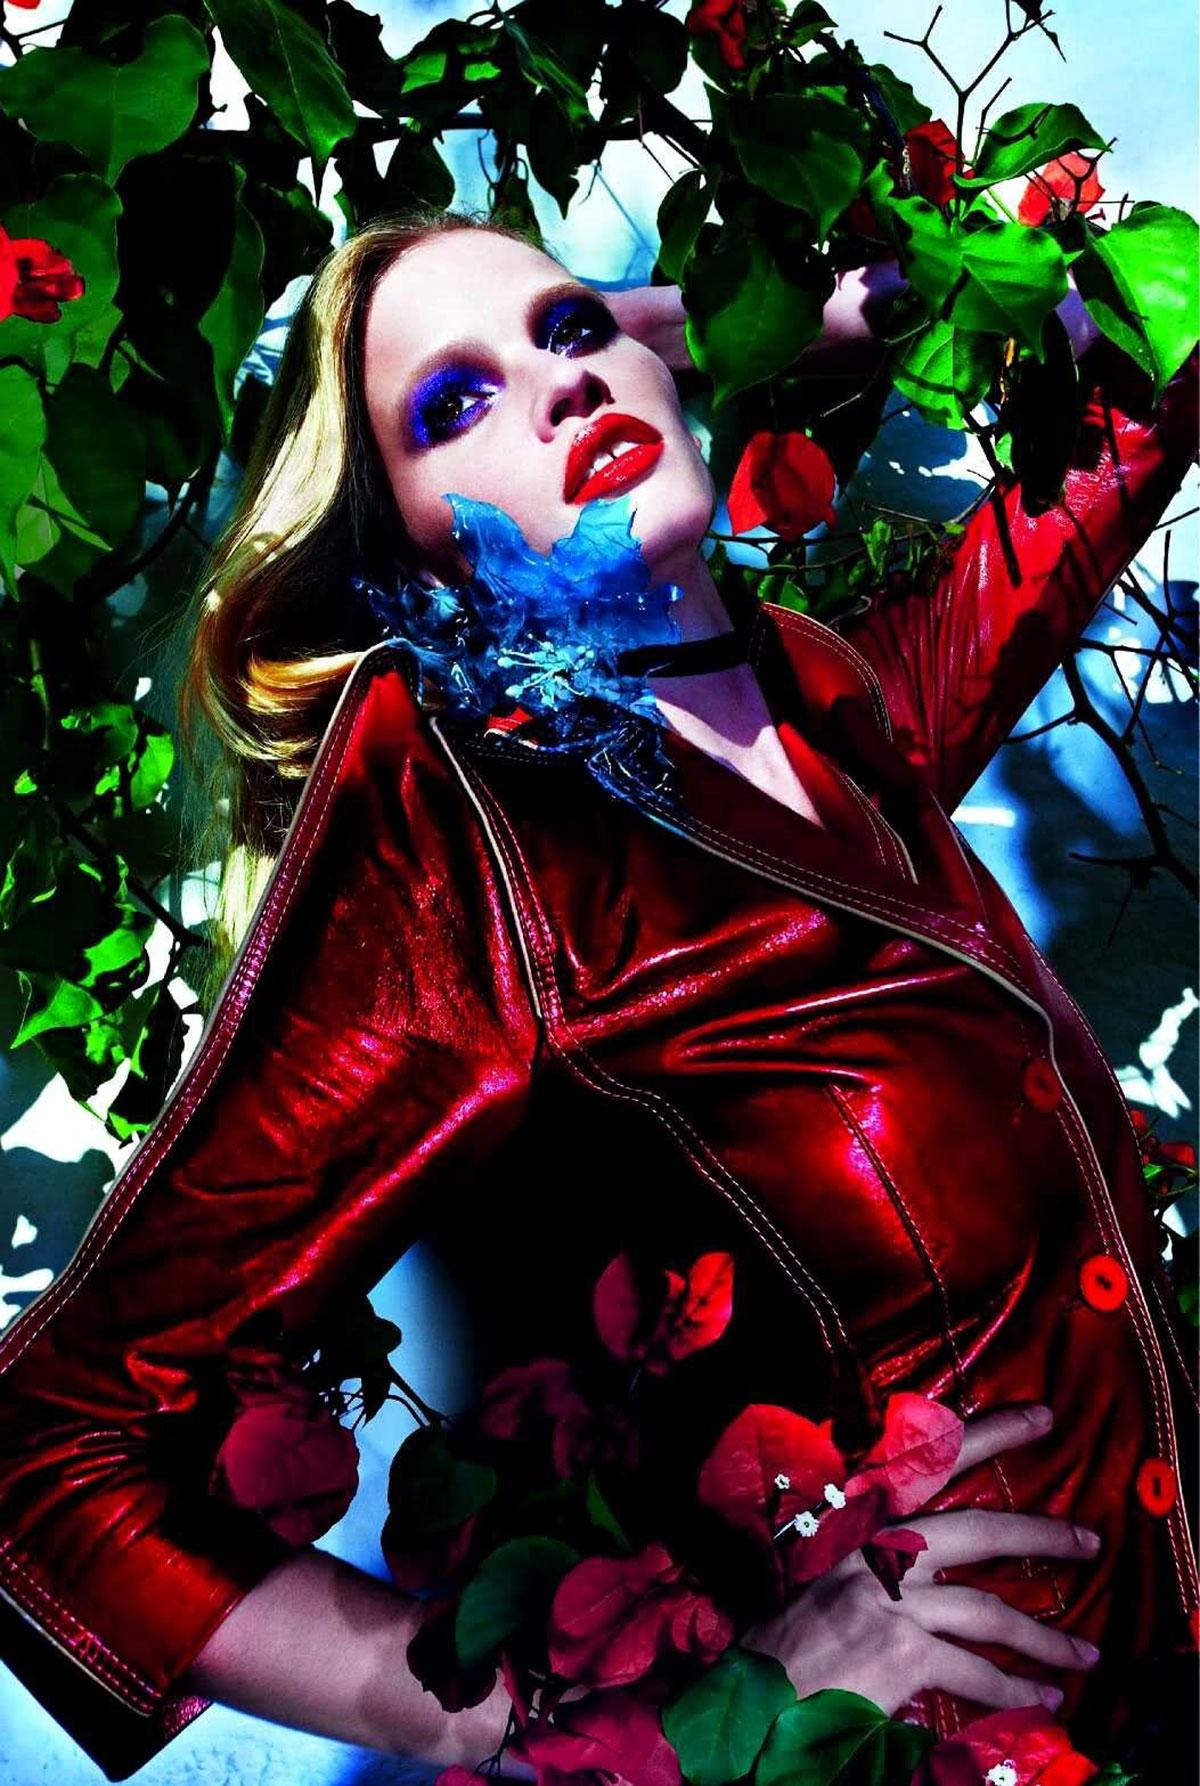 LARA STONE - Vogue Magazine Photoshoot by Mario Sorrenti